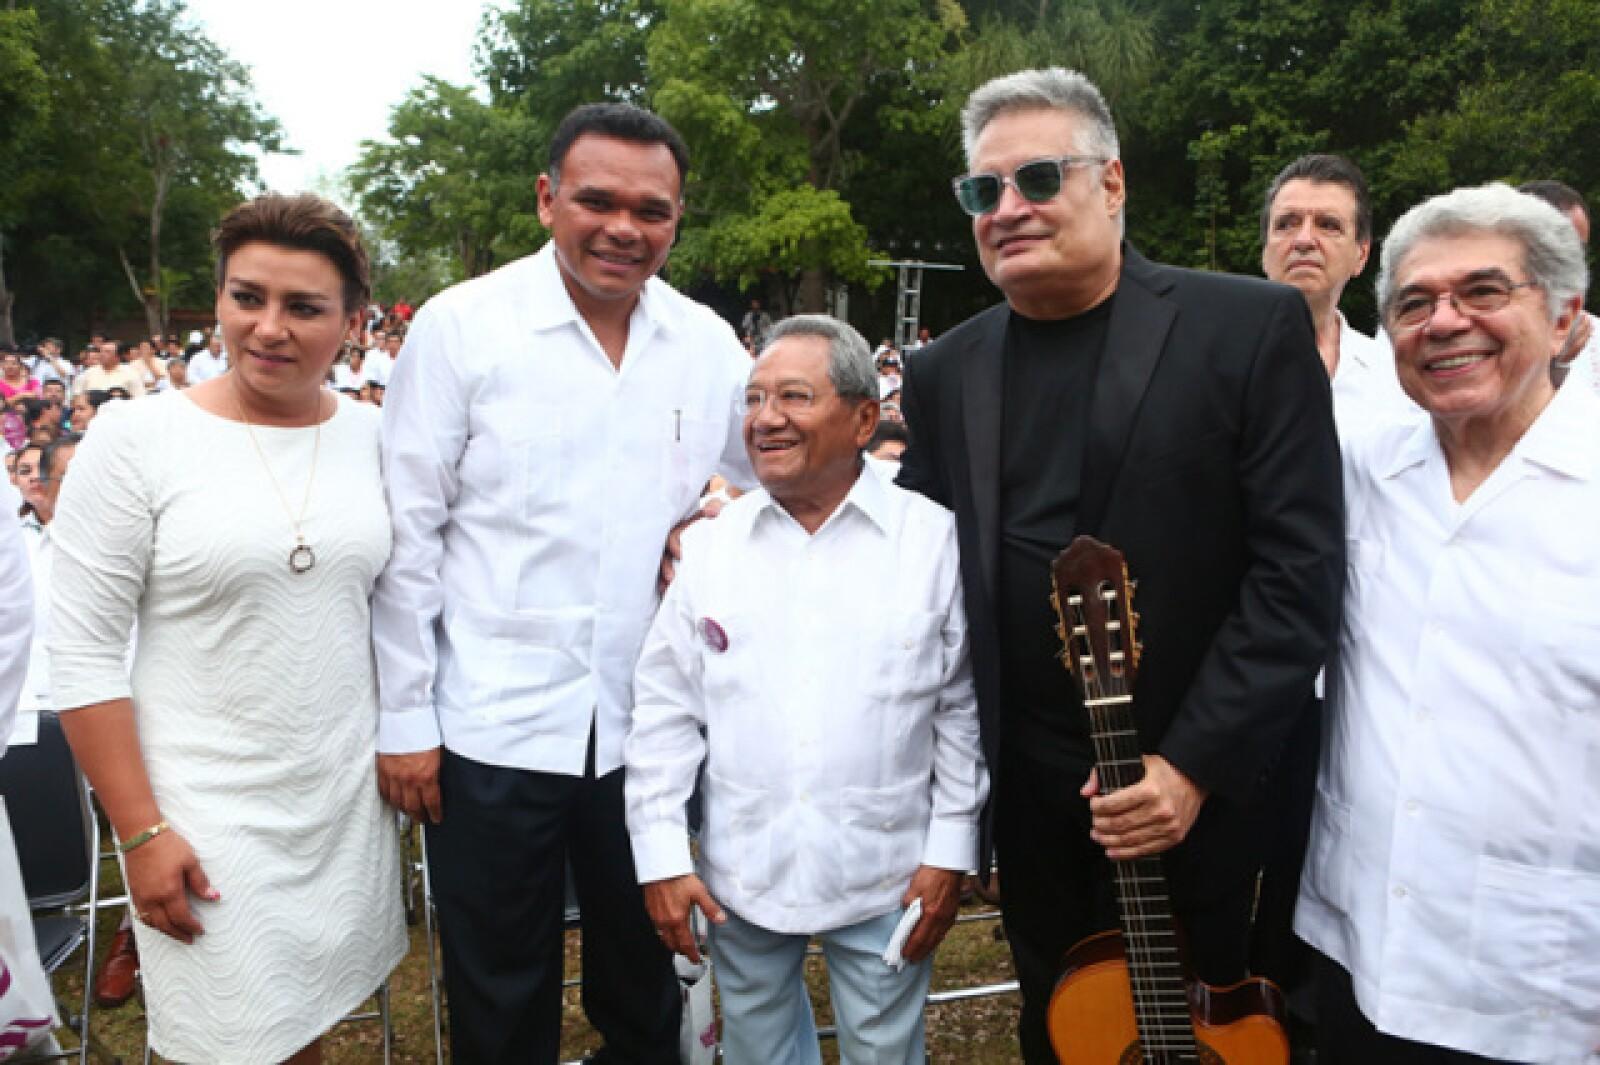 Sarita Blancarte, Rolando Zapata Bello, Armando Manzanero, Amauri Pérez y Jorge Esma